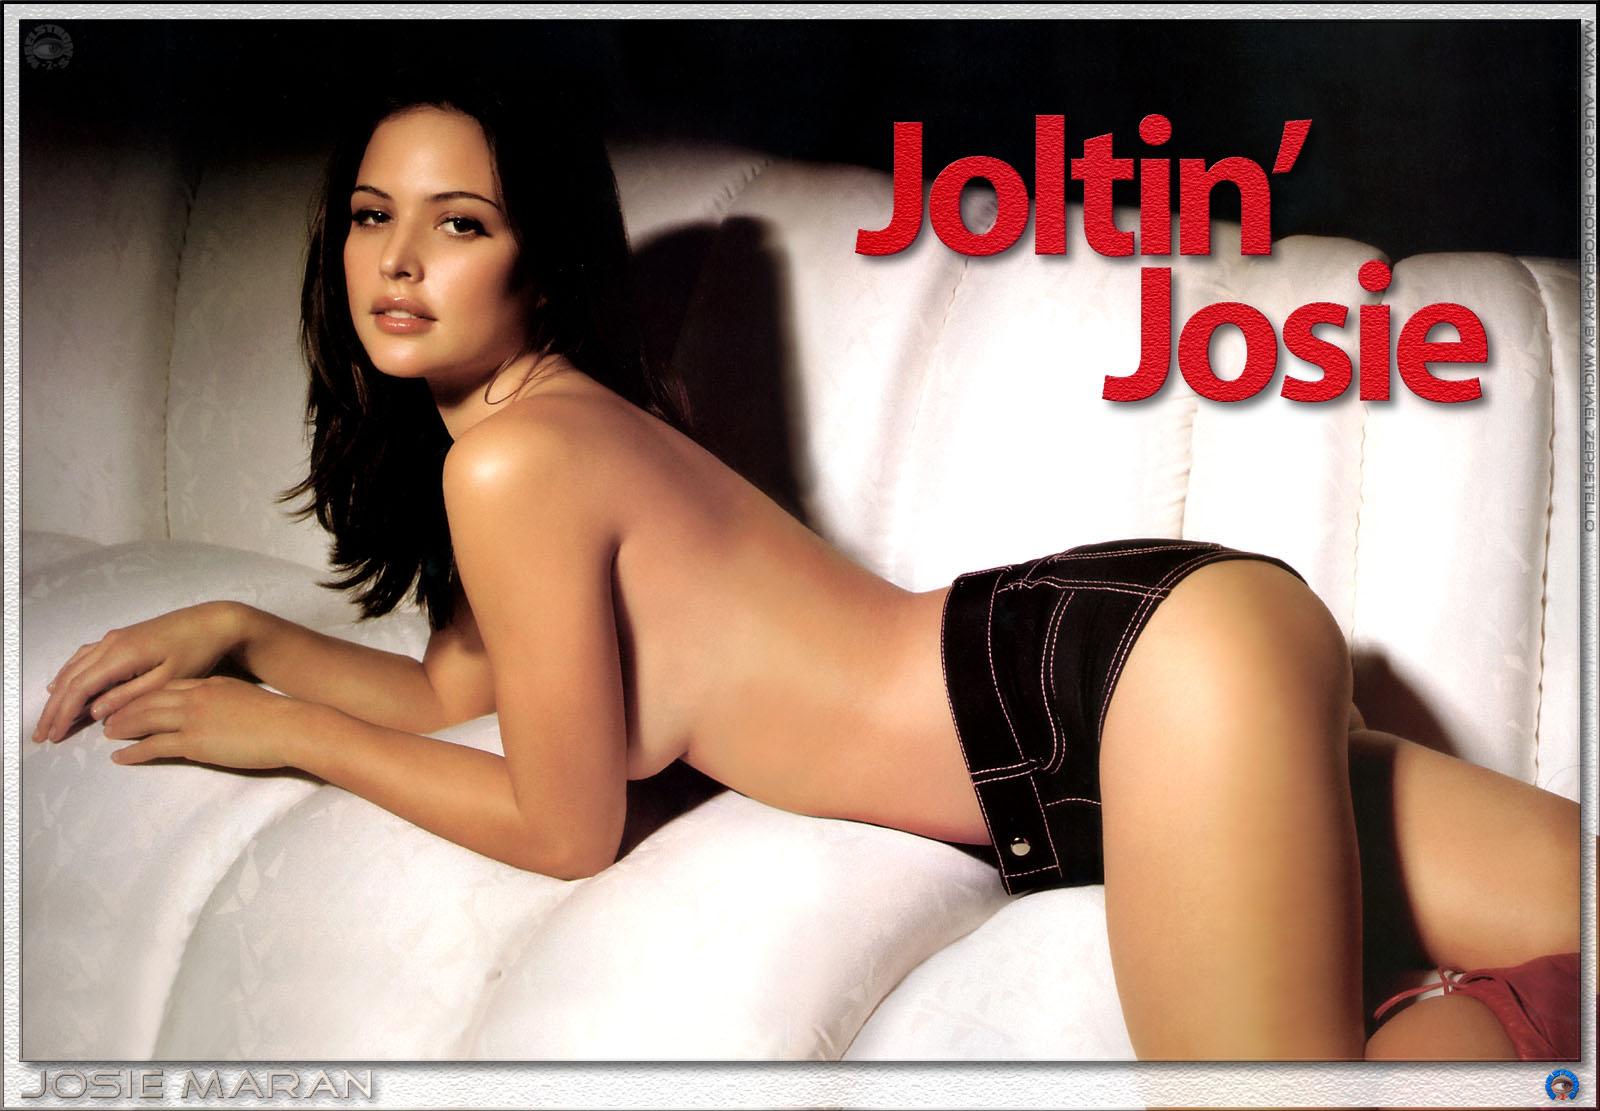 http://2.bp.blogspot.com/_gdq4UJnJW5E/S-NI2YaH2TI/AAAAAAAAB0w/fOEMnIwigeg/s1600/Josie+Maran+20.jpg